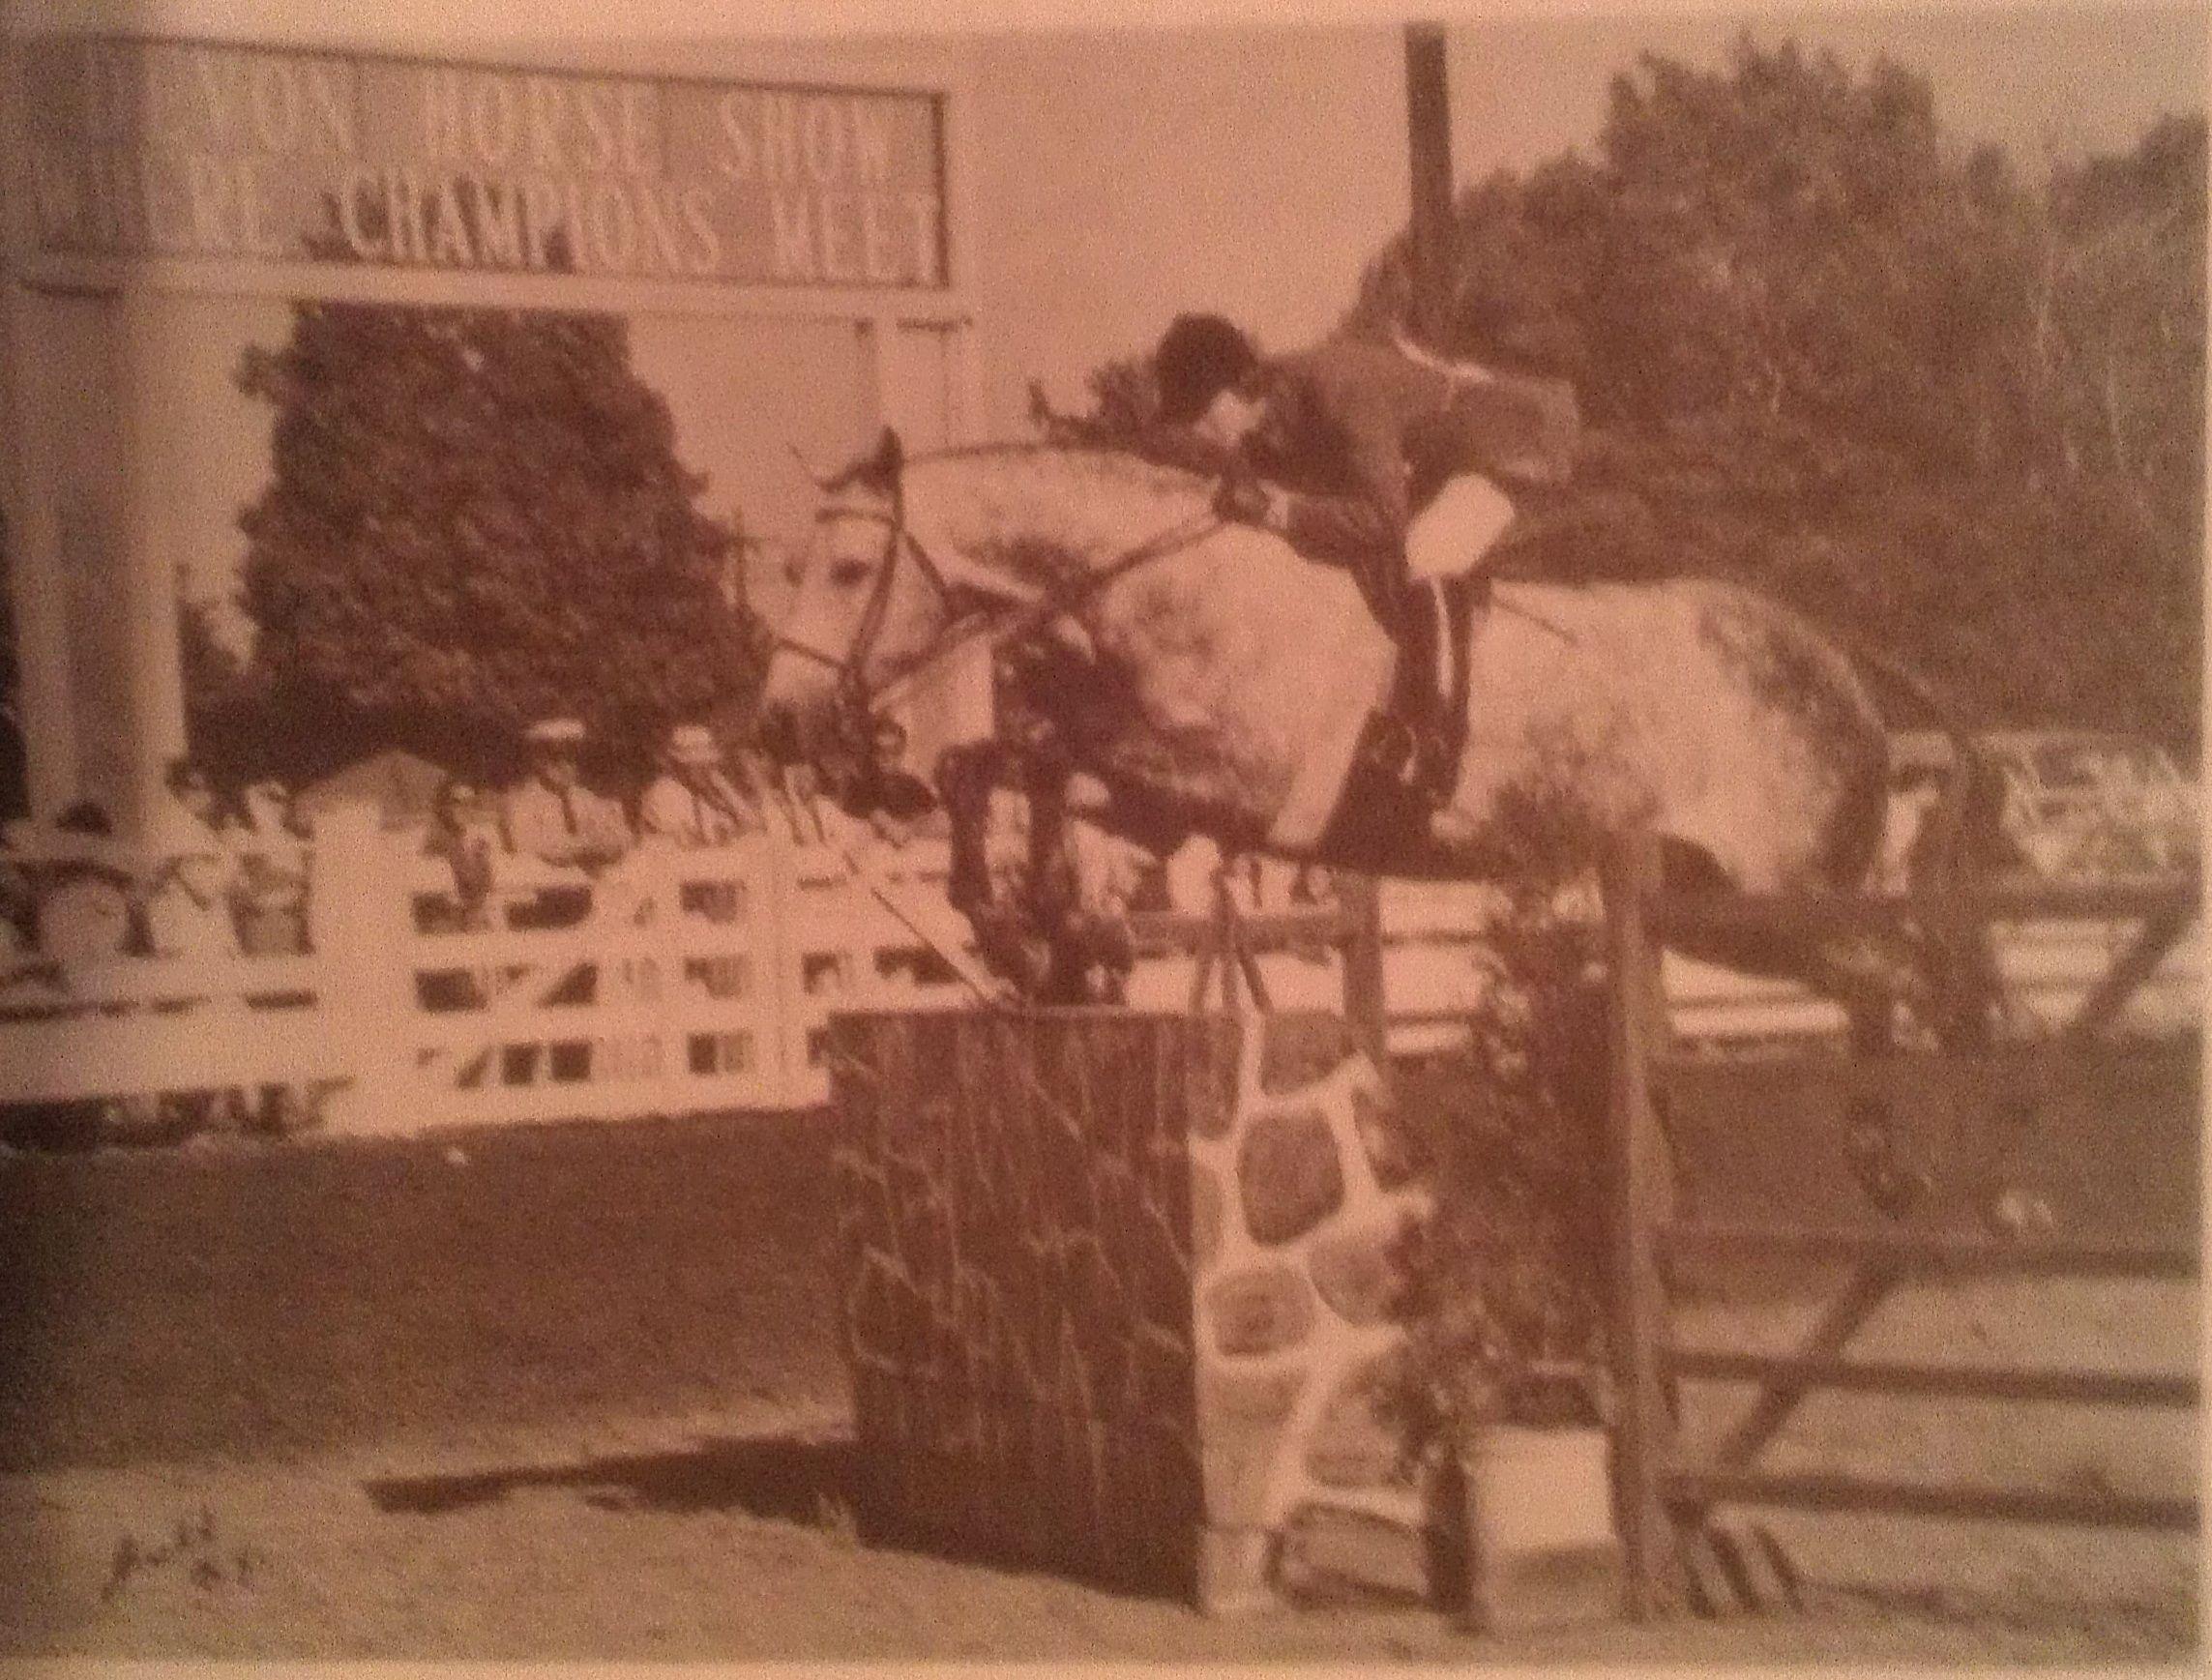 Goodboy Dee Amp Kip Rosenthal At Devon In 1967 Jr Hunter Of